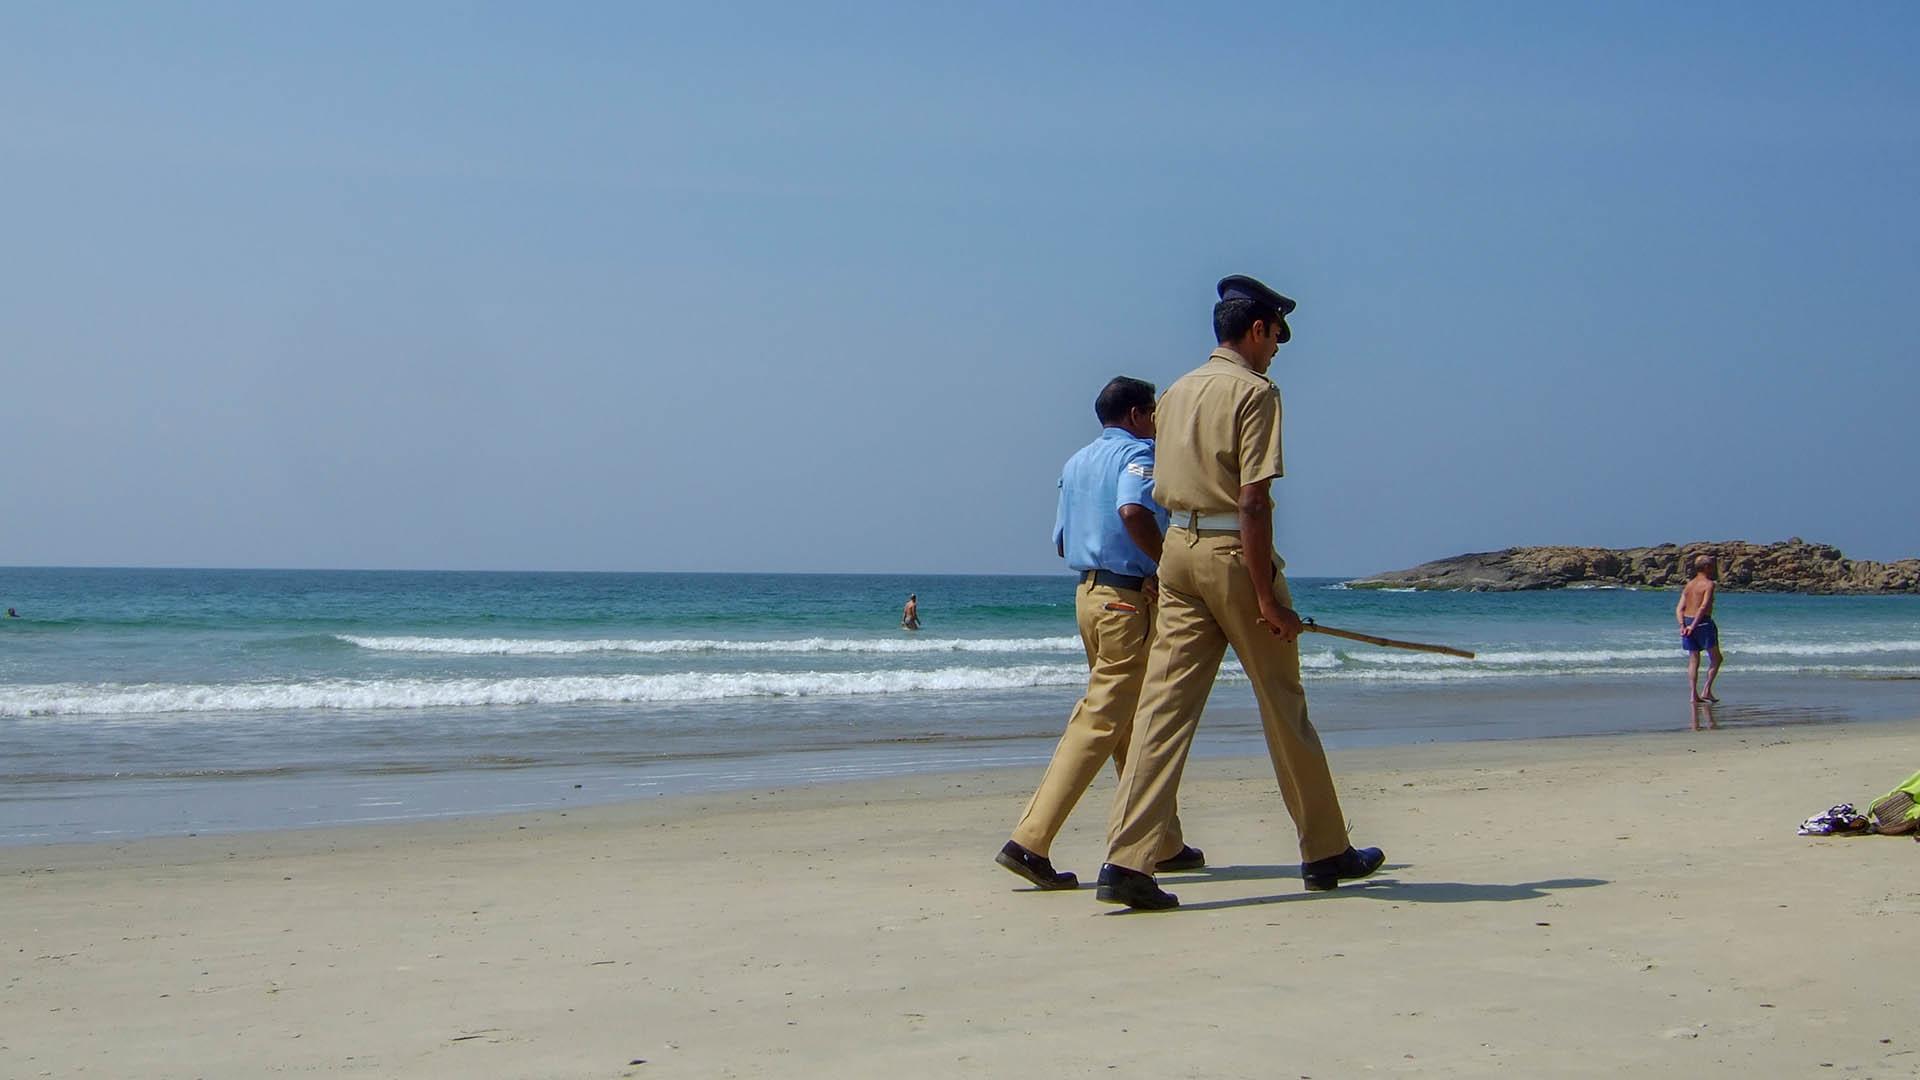 Eli sopalı turist polisi